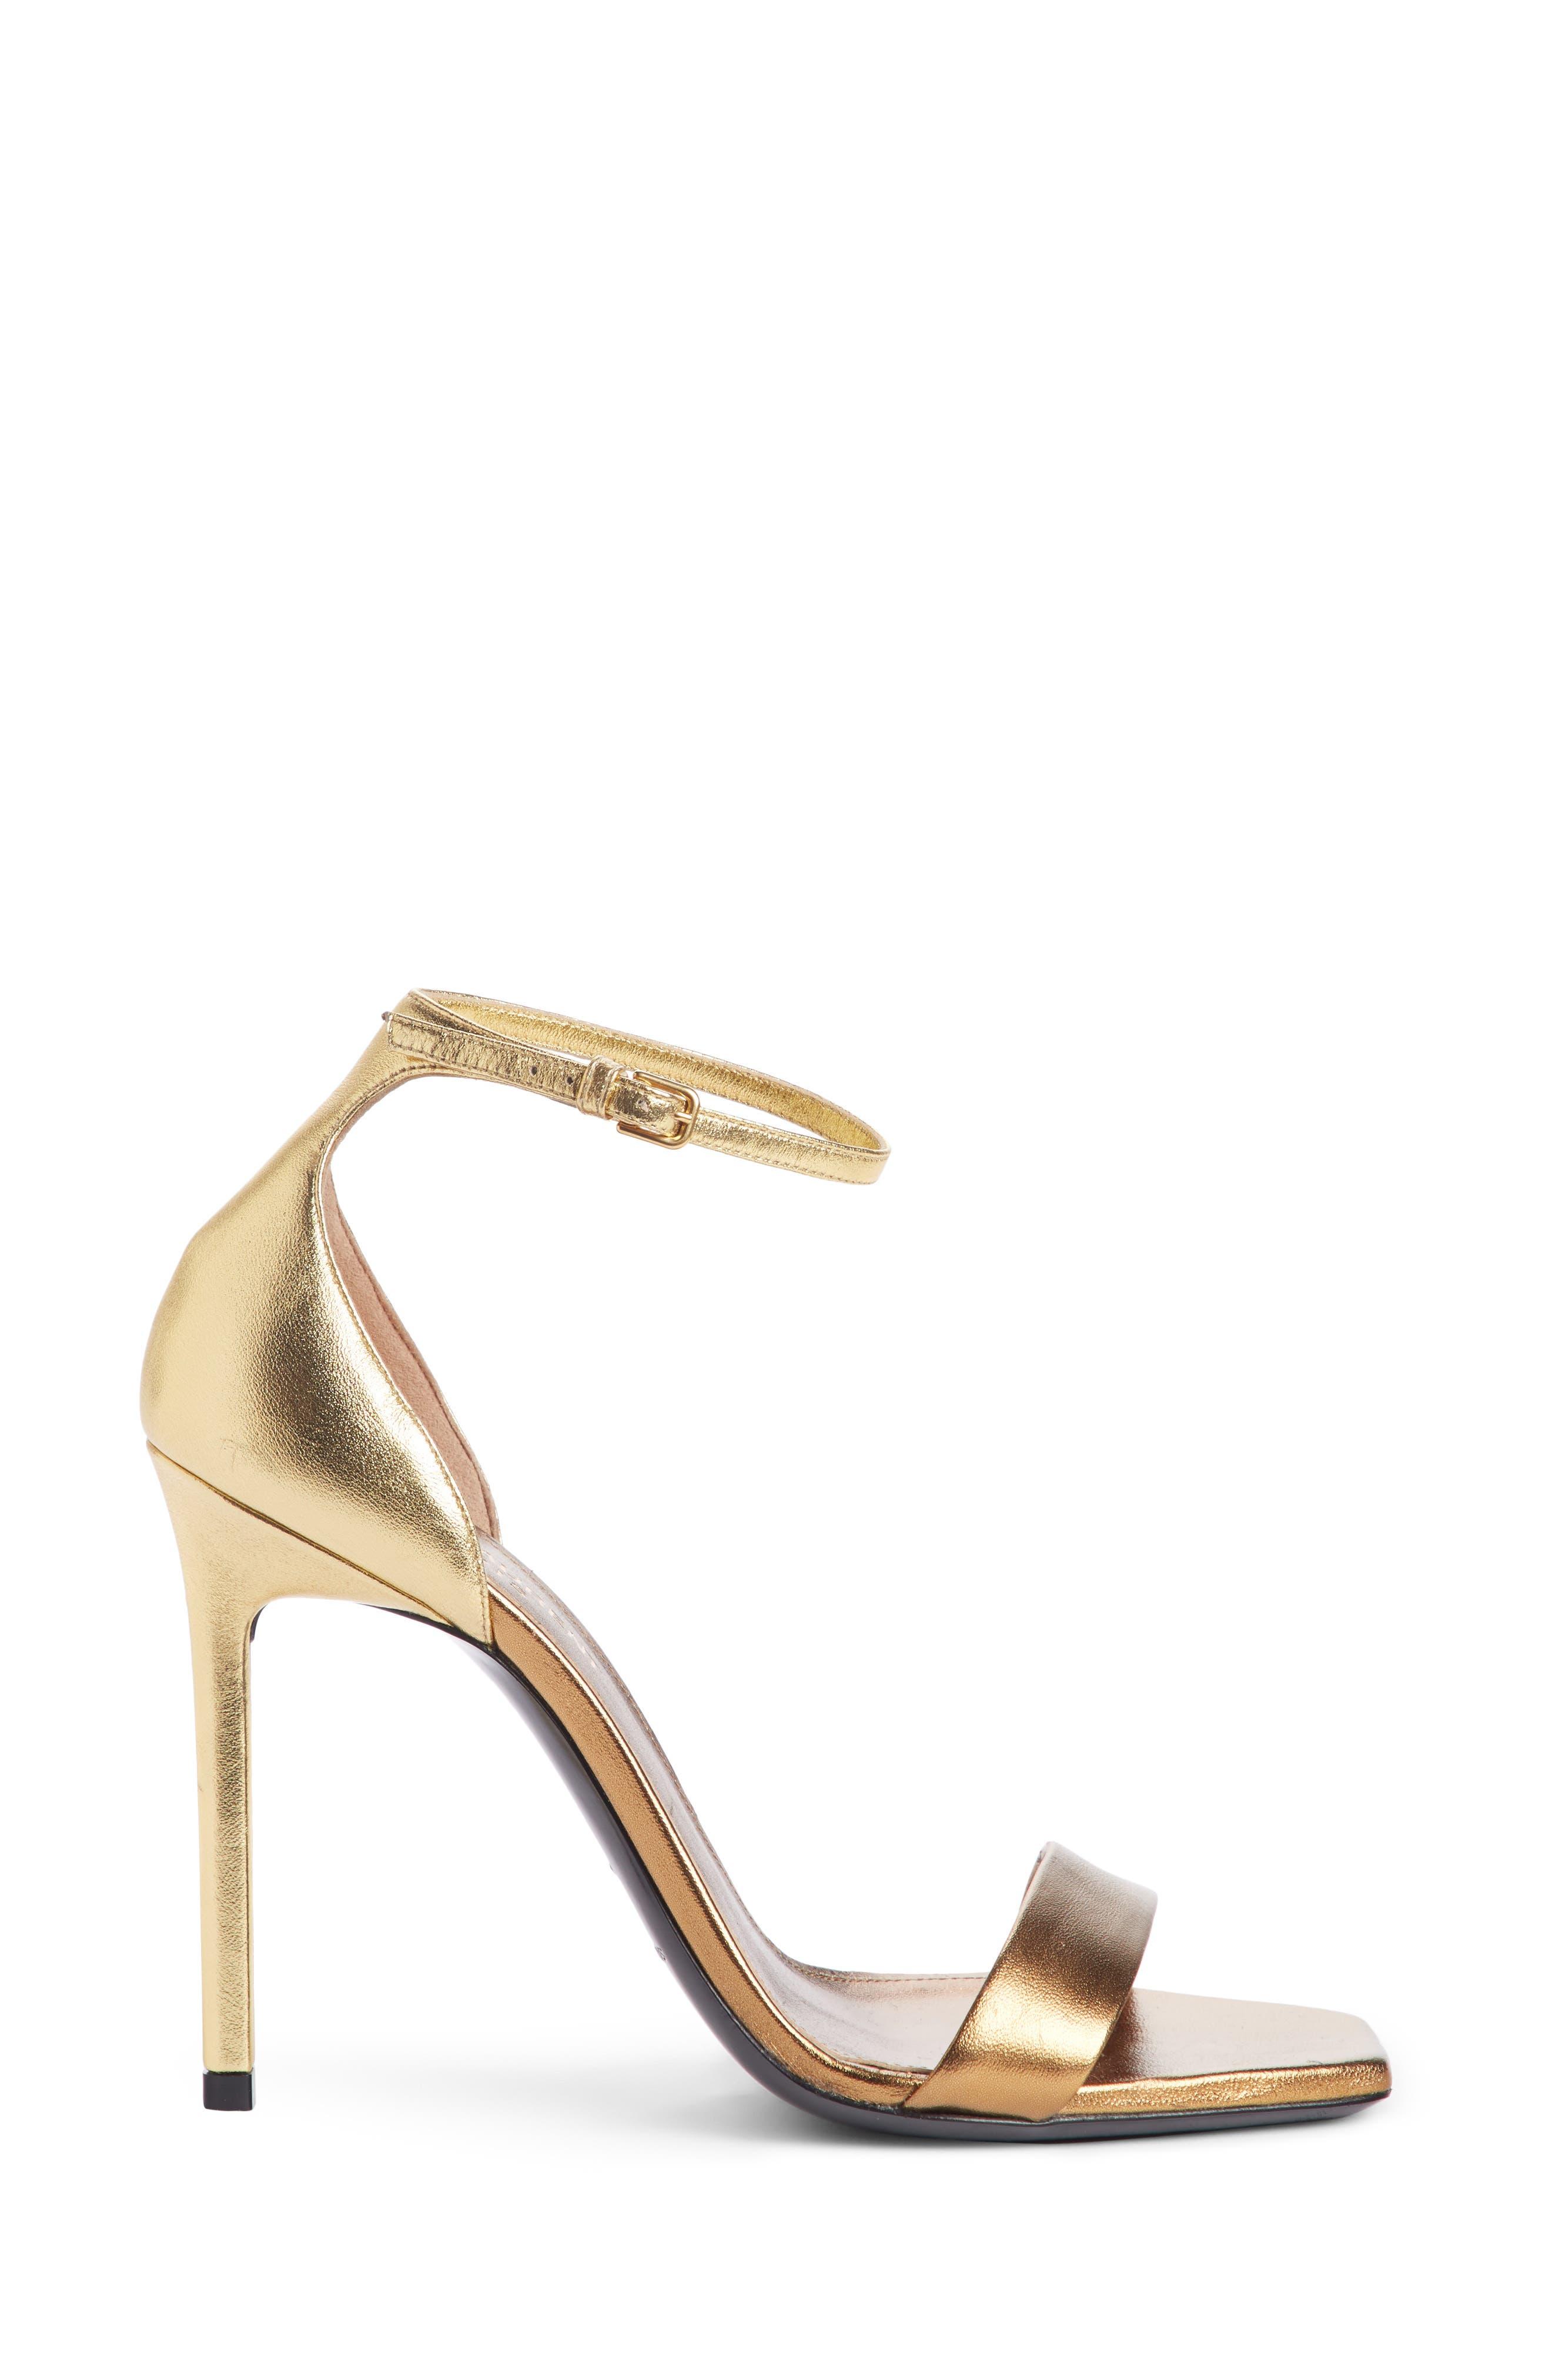 Amber Ankle Strap Sandal,                             Alternate thumbnail 3, color,                             BRONZE GOLD